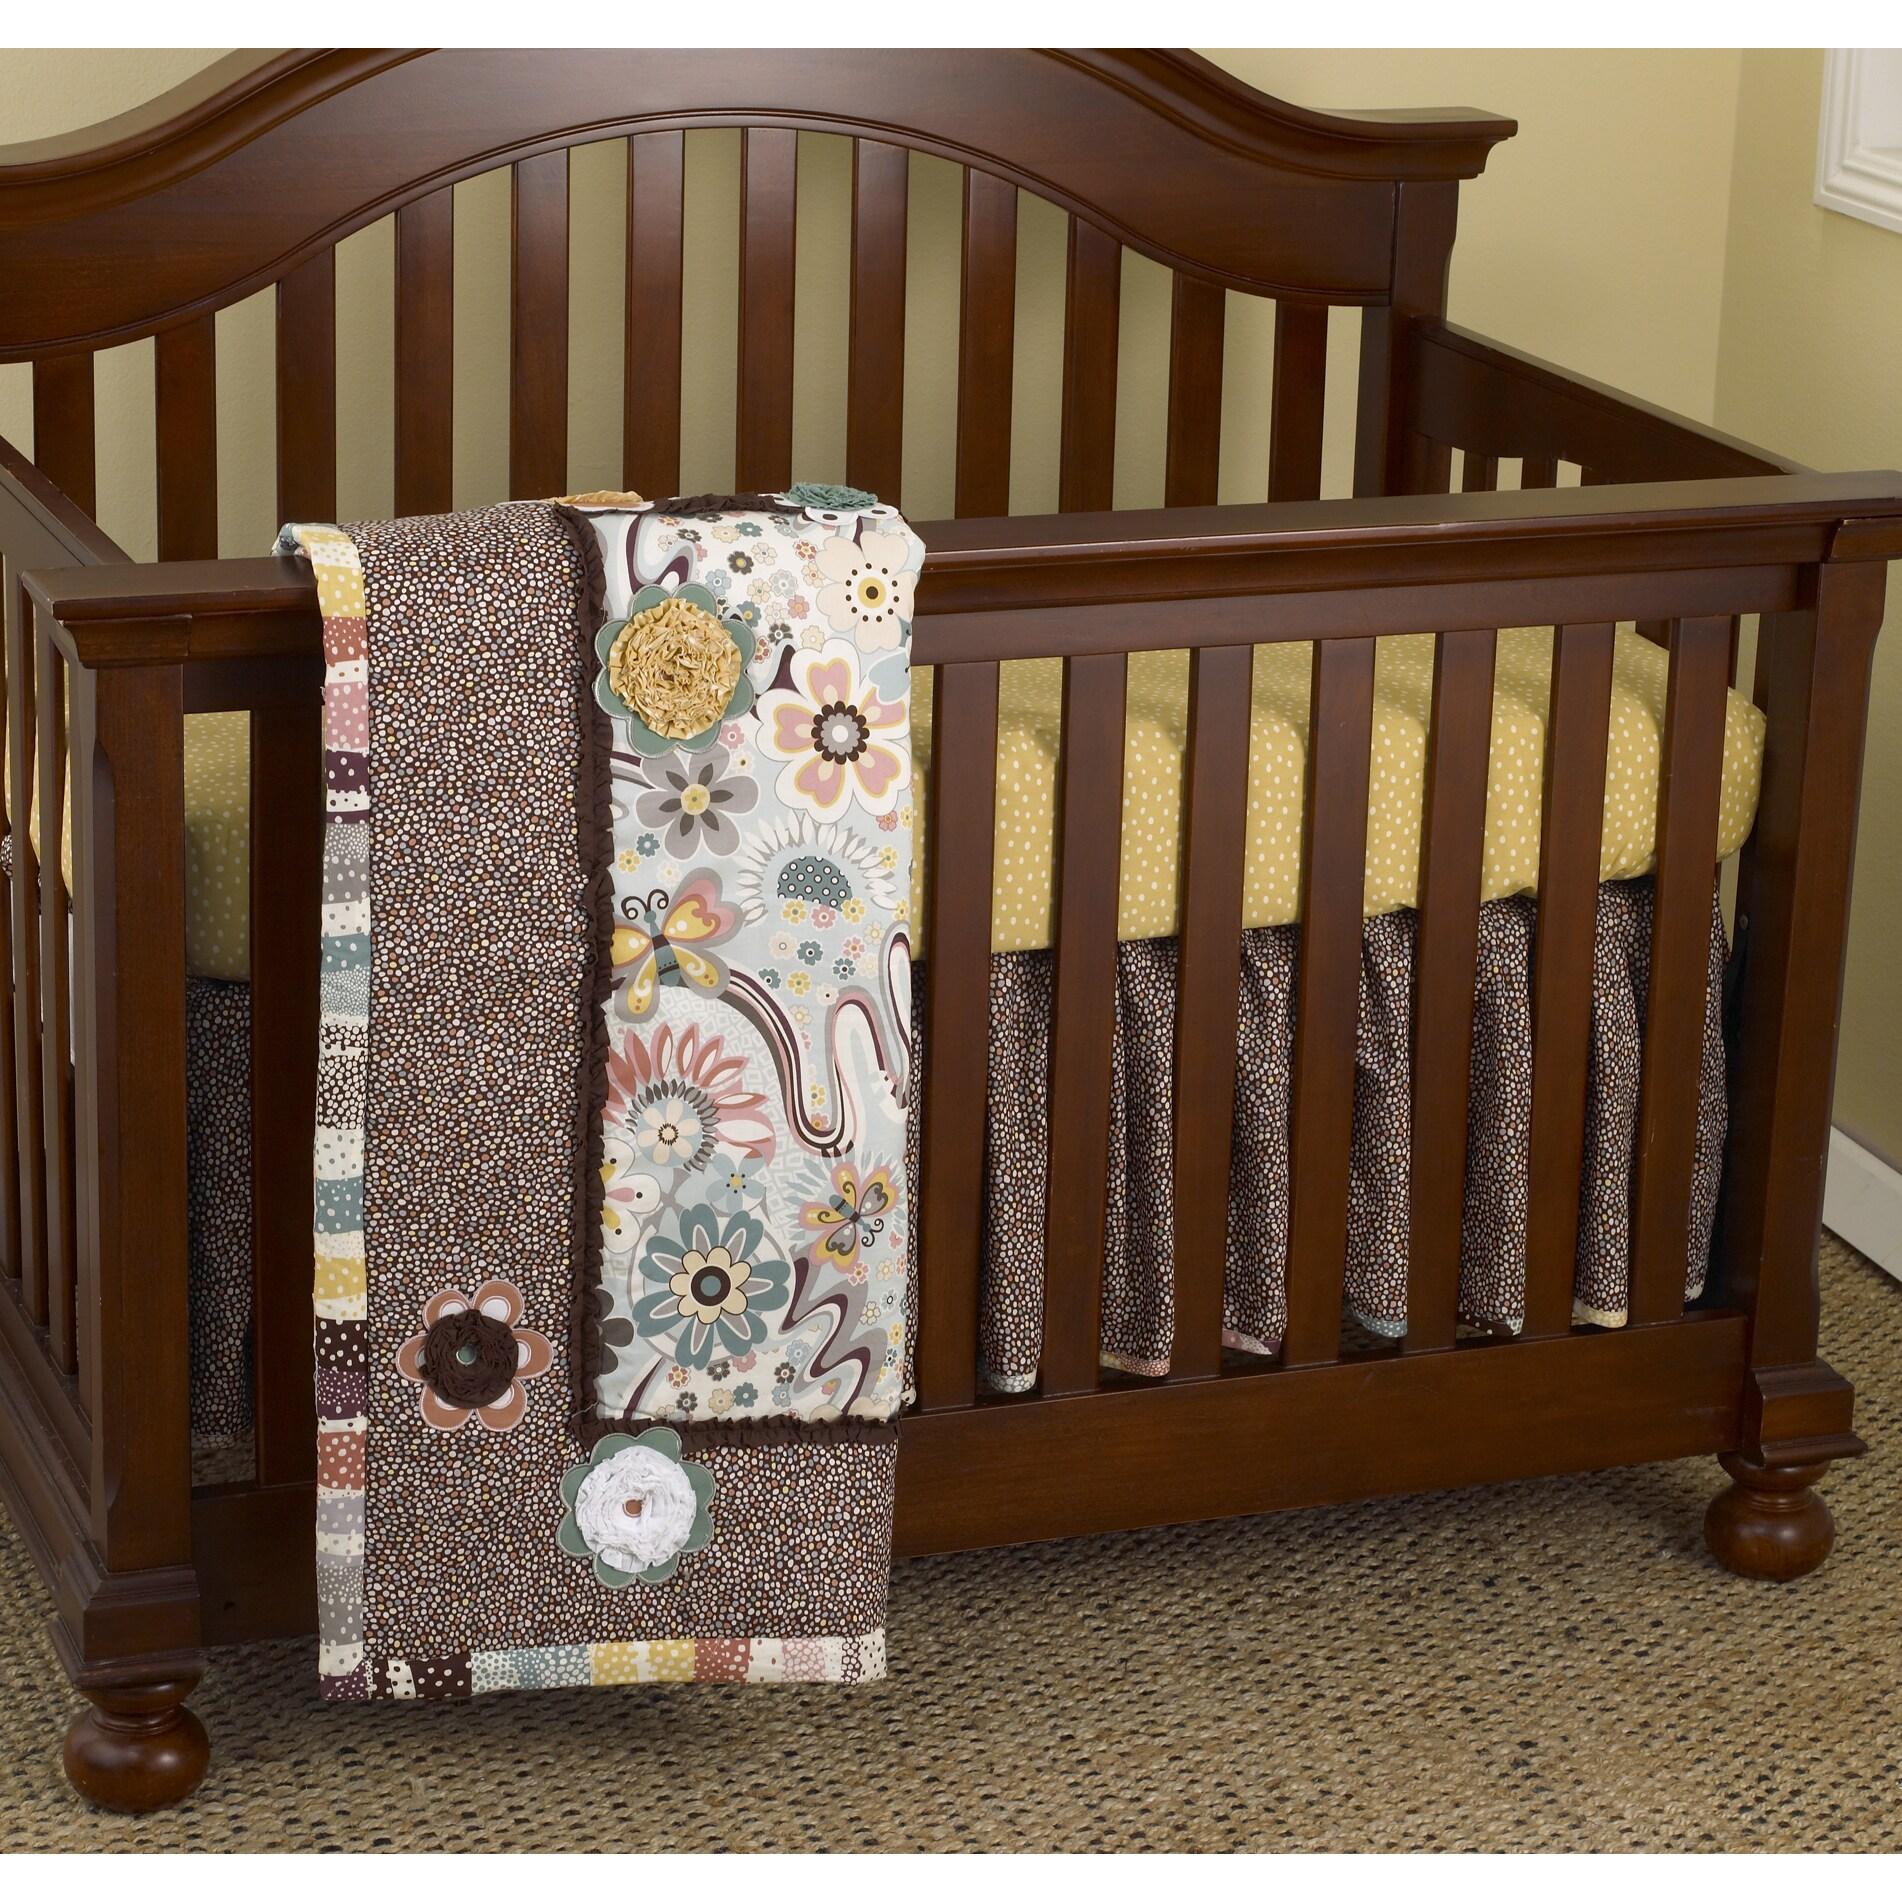 Cotton Tale Penny Lane 7-piece Crib Bedding Set (Cotton T...